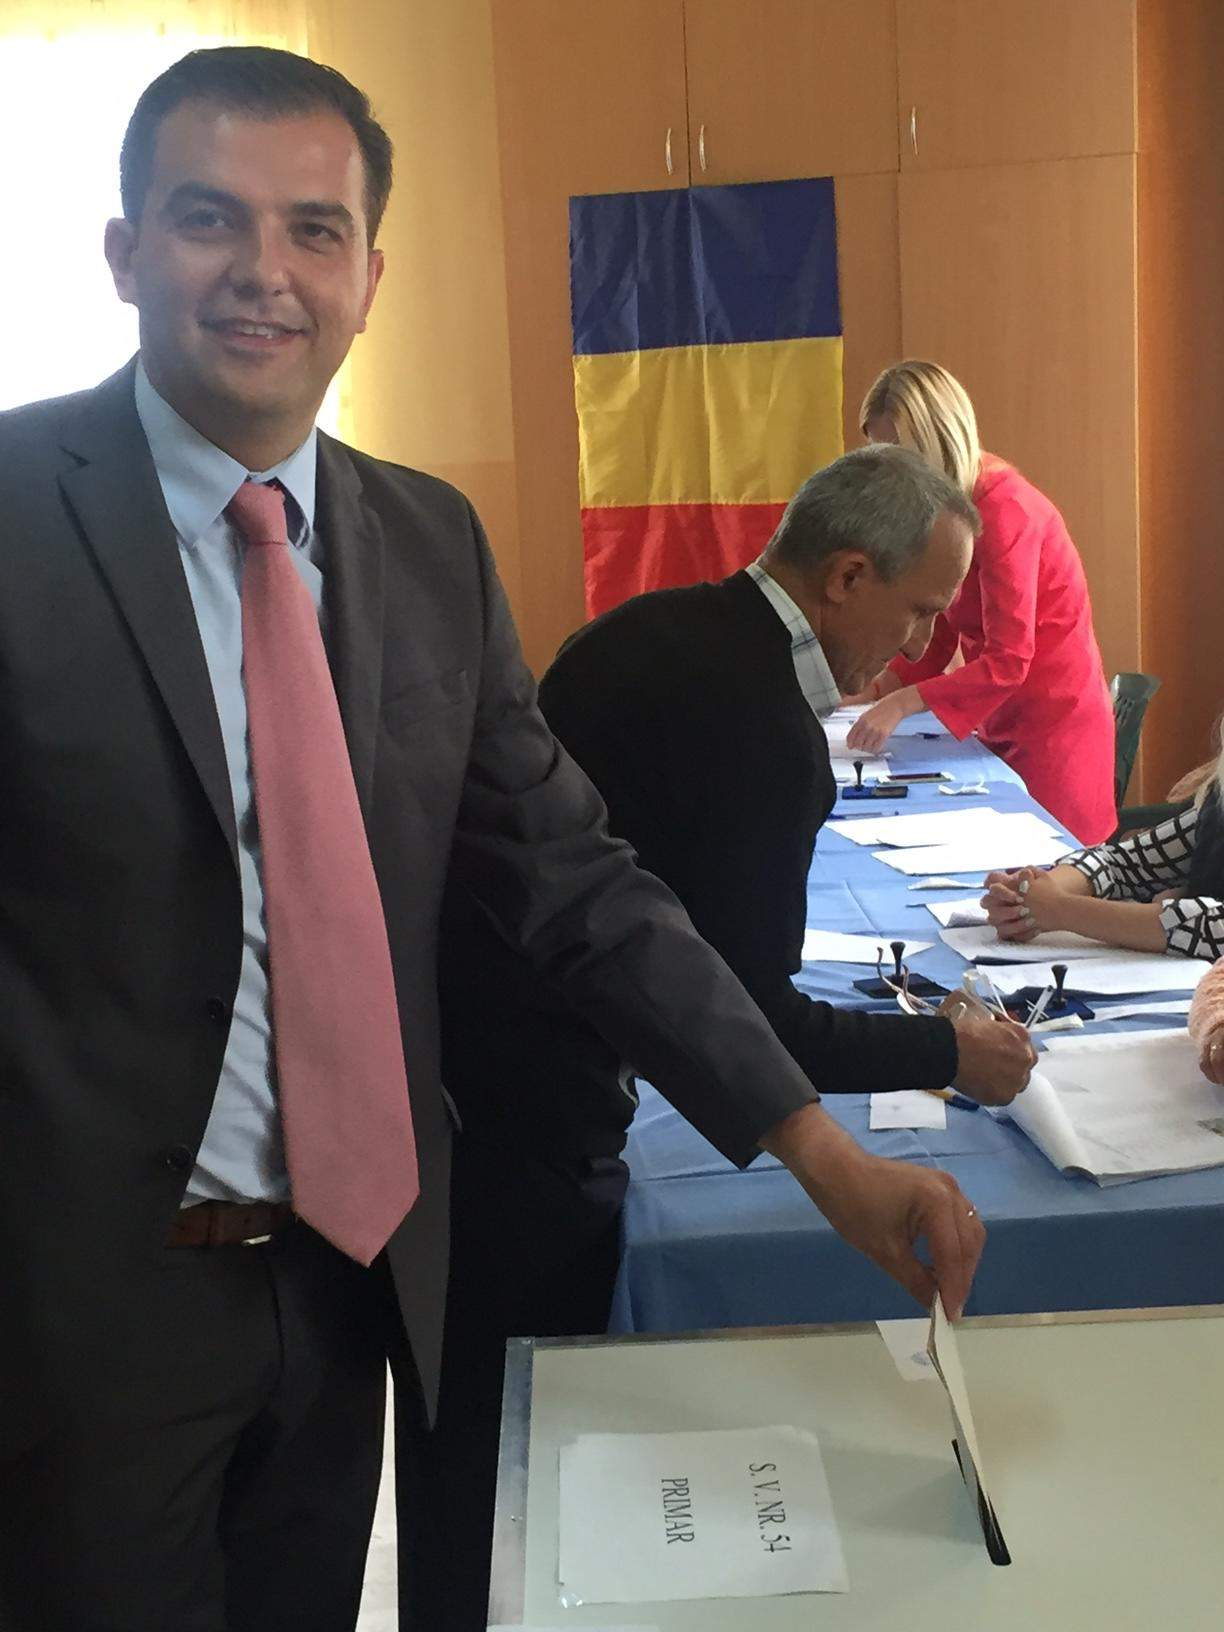 vot Bulumac